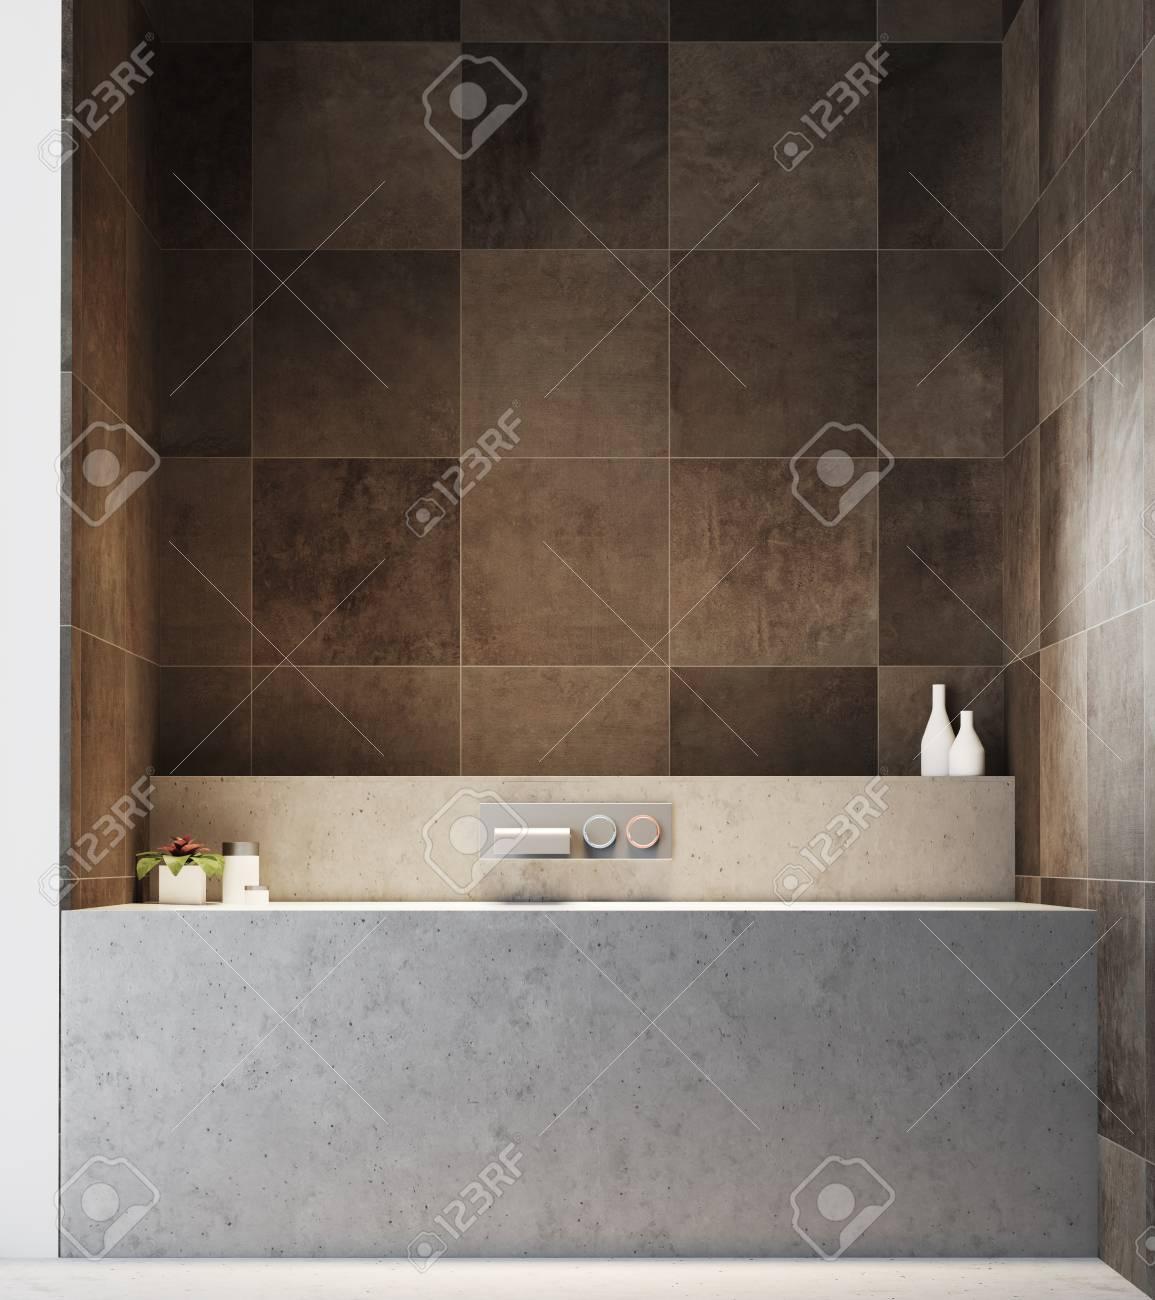 Dark Tiled Bathroom Interior With A Concrete Floor, And A Gray ...